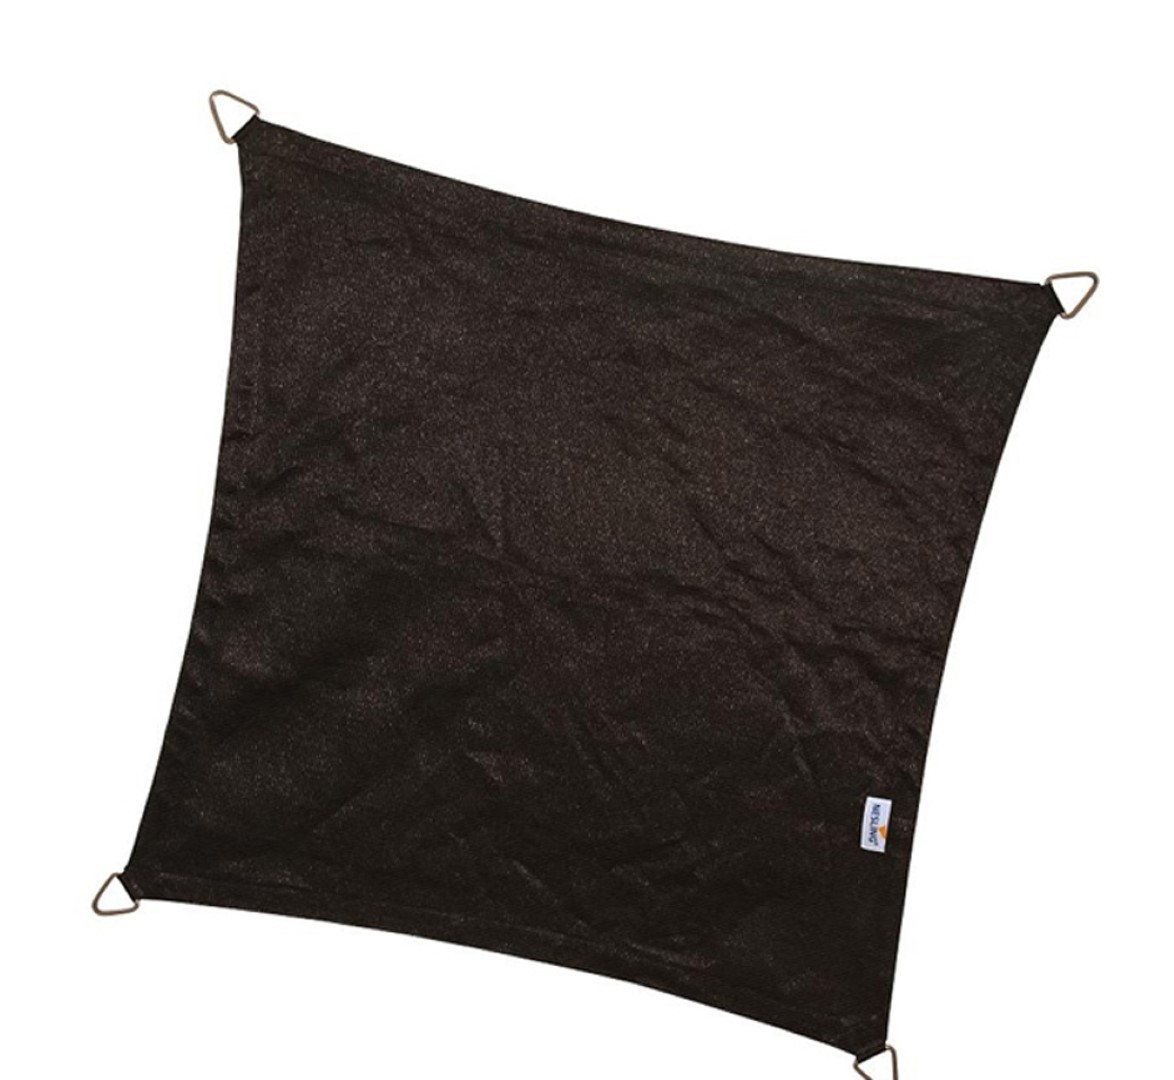 Vierkant 3,6 x 3,6 x 3,6 x 3,6m, Zwart